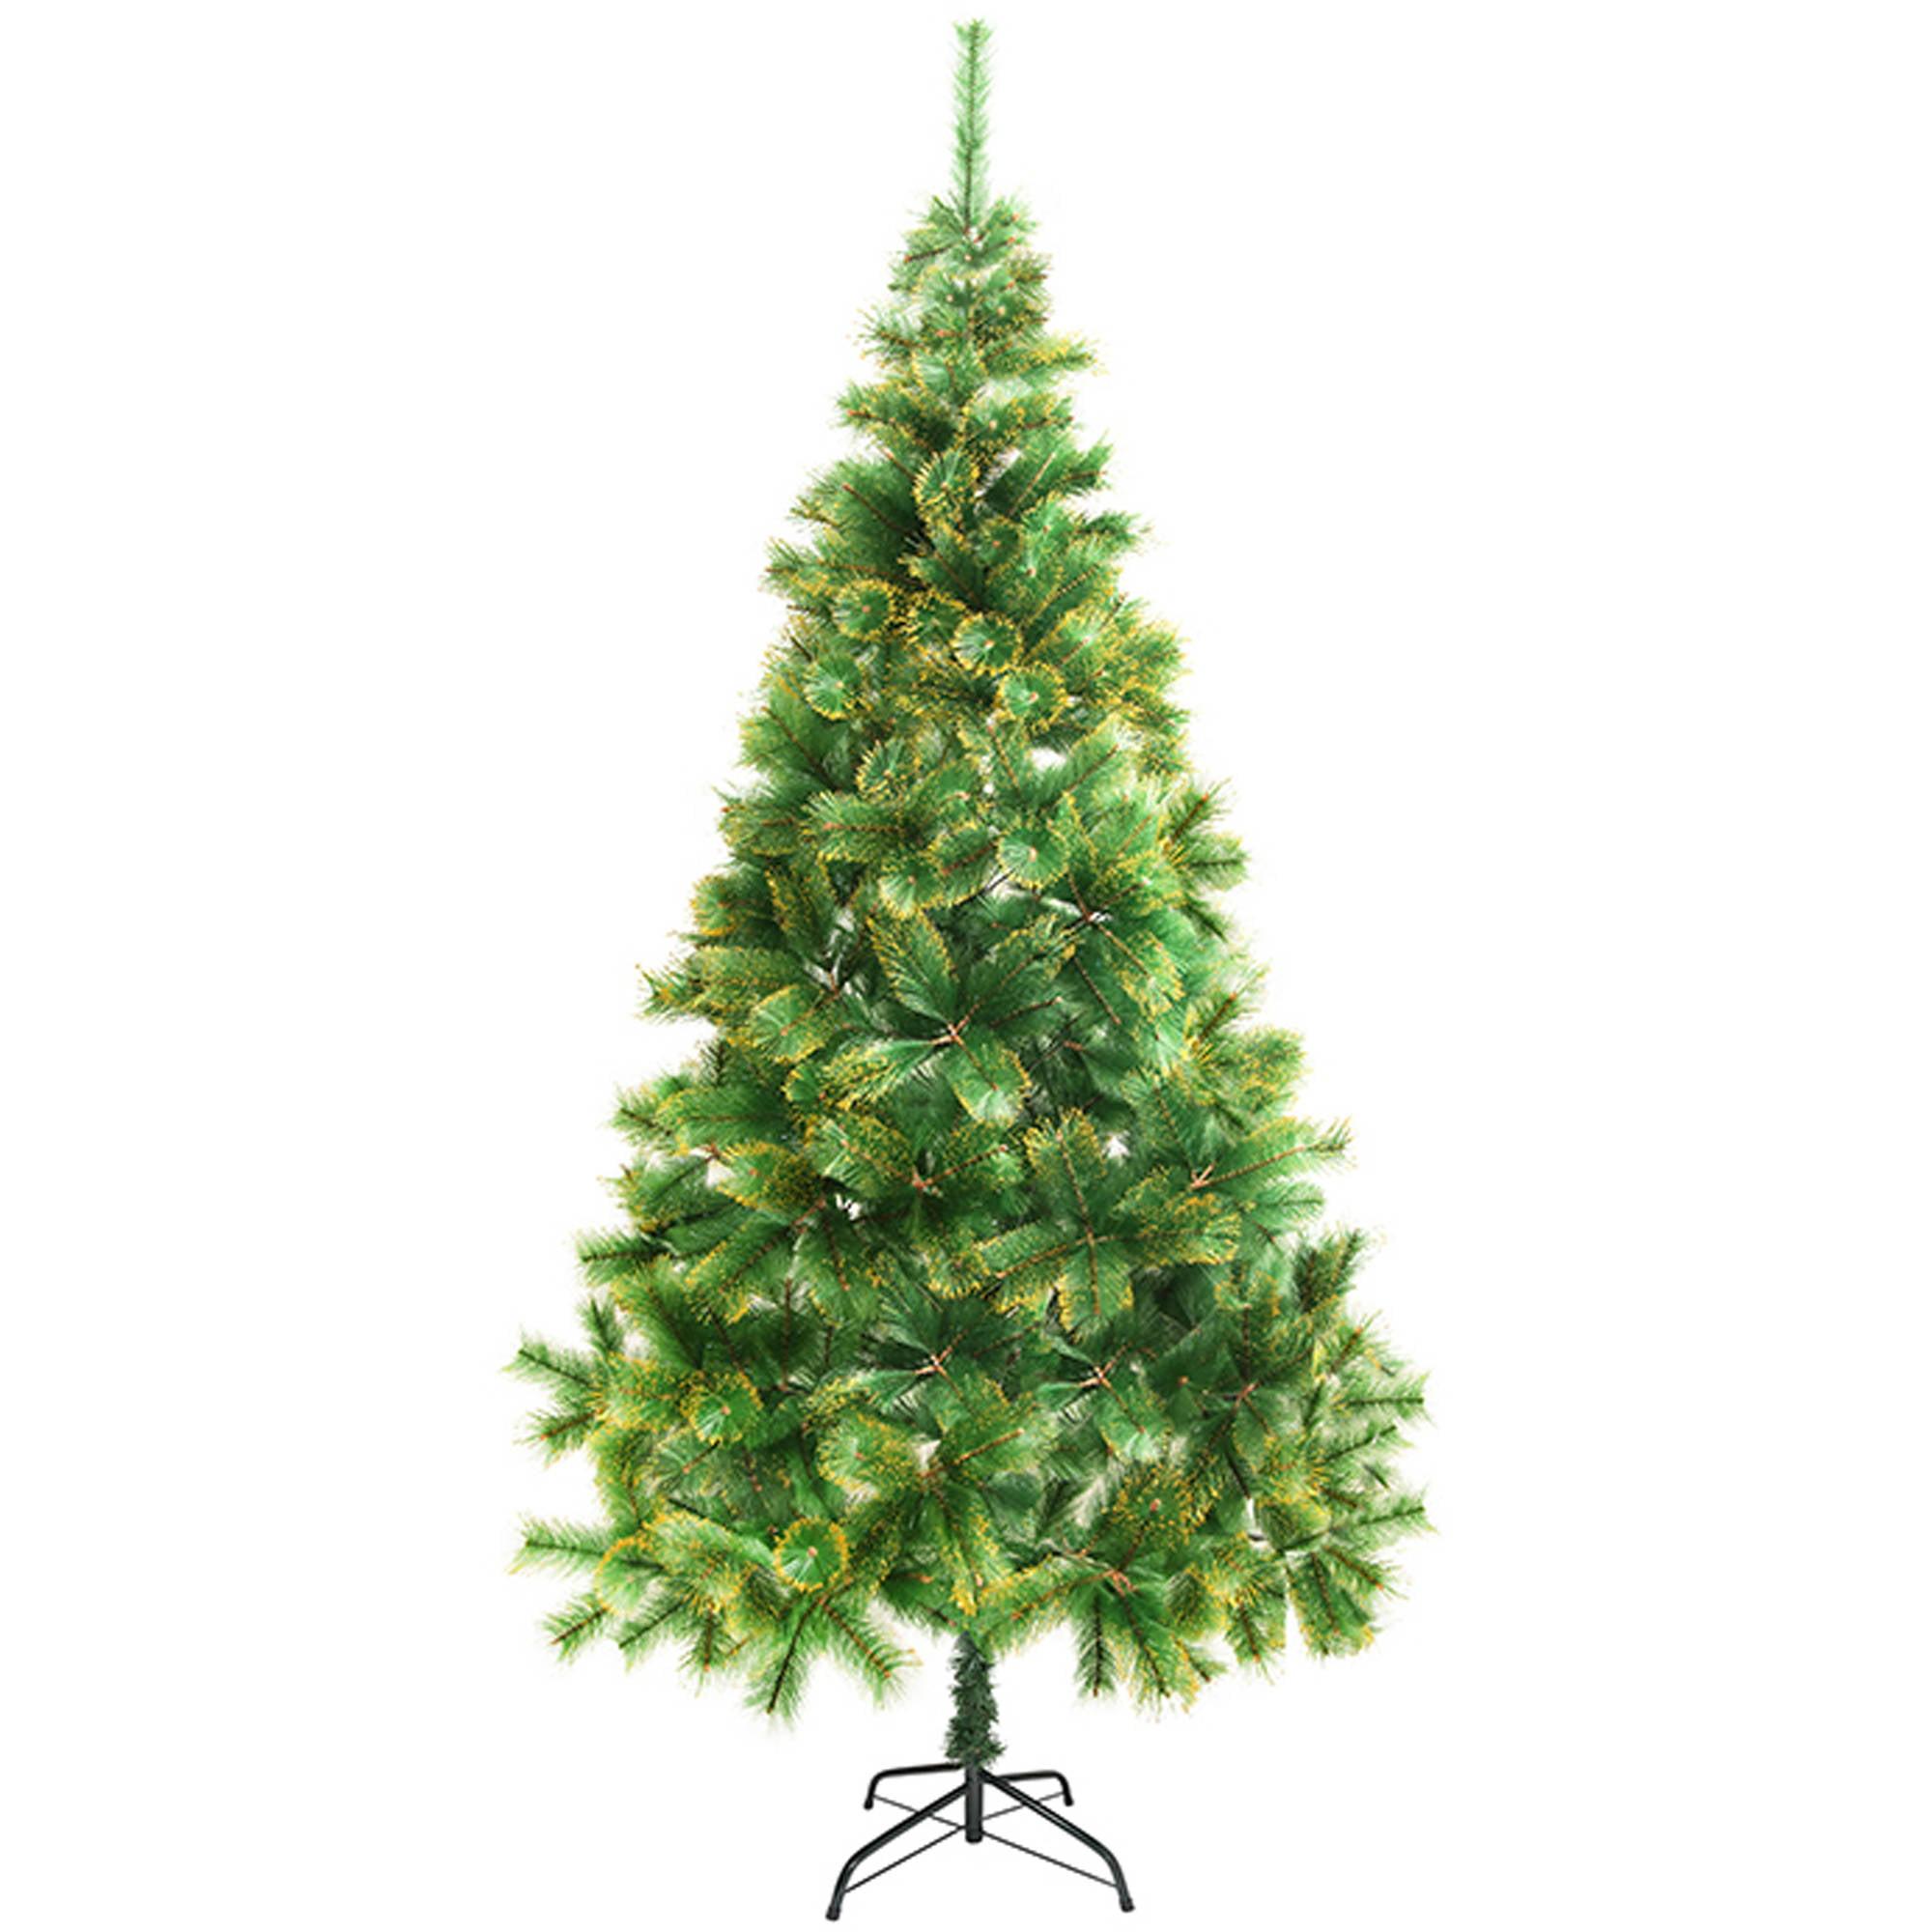 ALEKO CT83H14 Artificial Christmas Tree, 6.8', Green